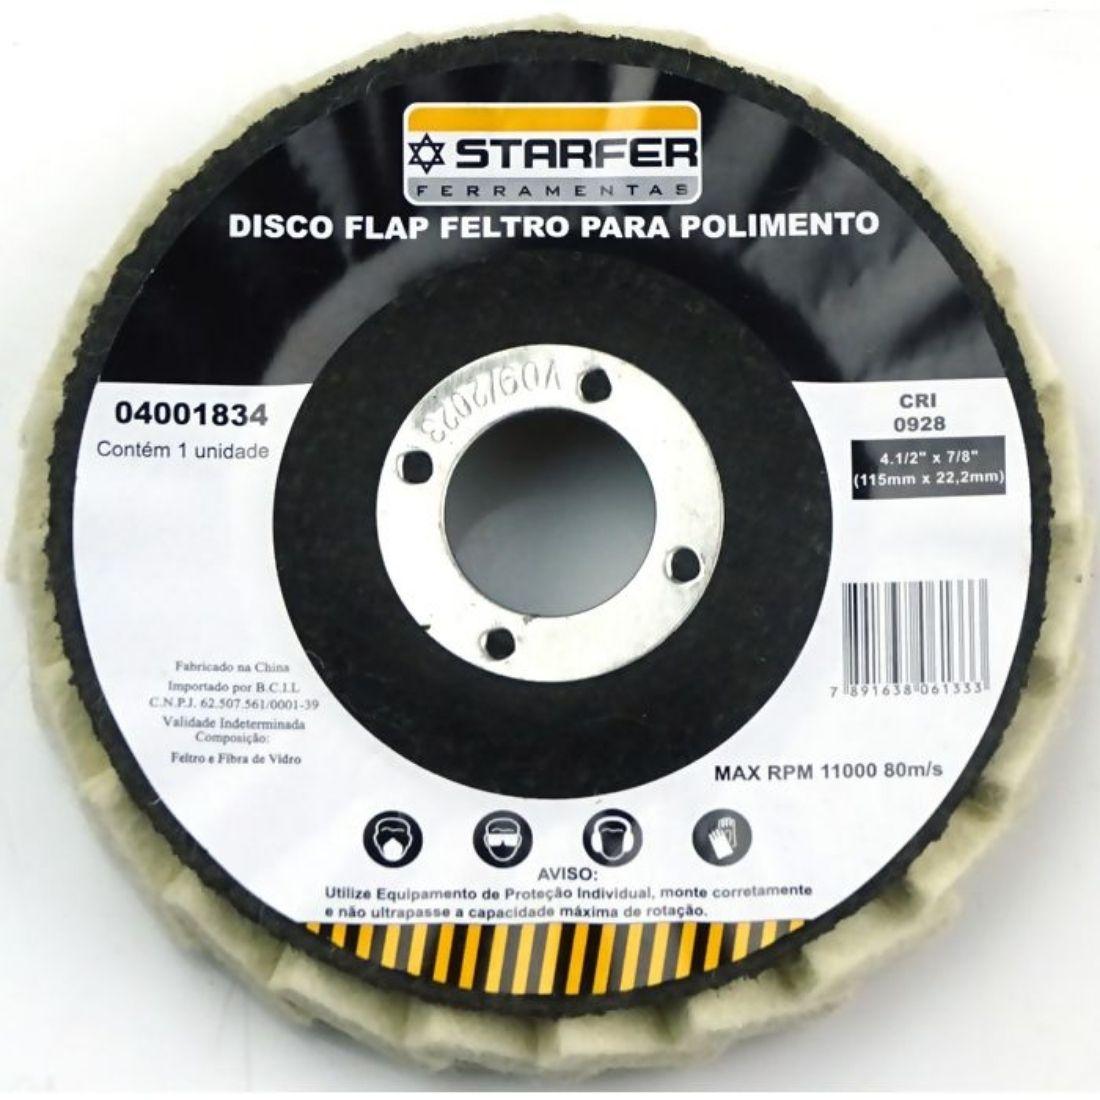 Disco Flap para Polimento 4.1/2 - Starfer